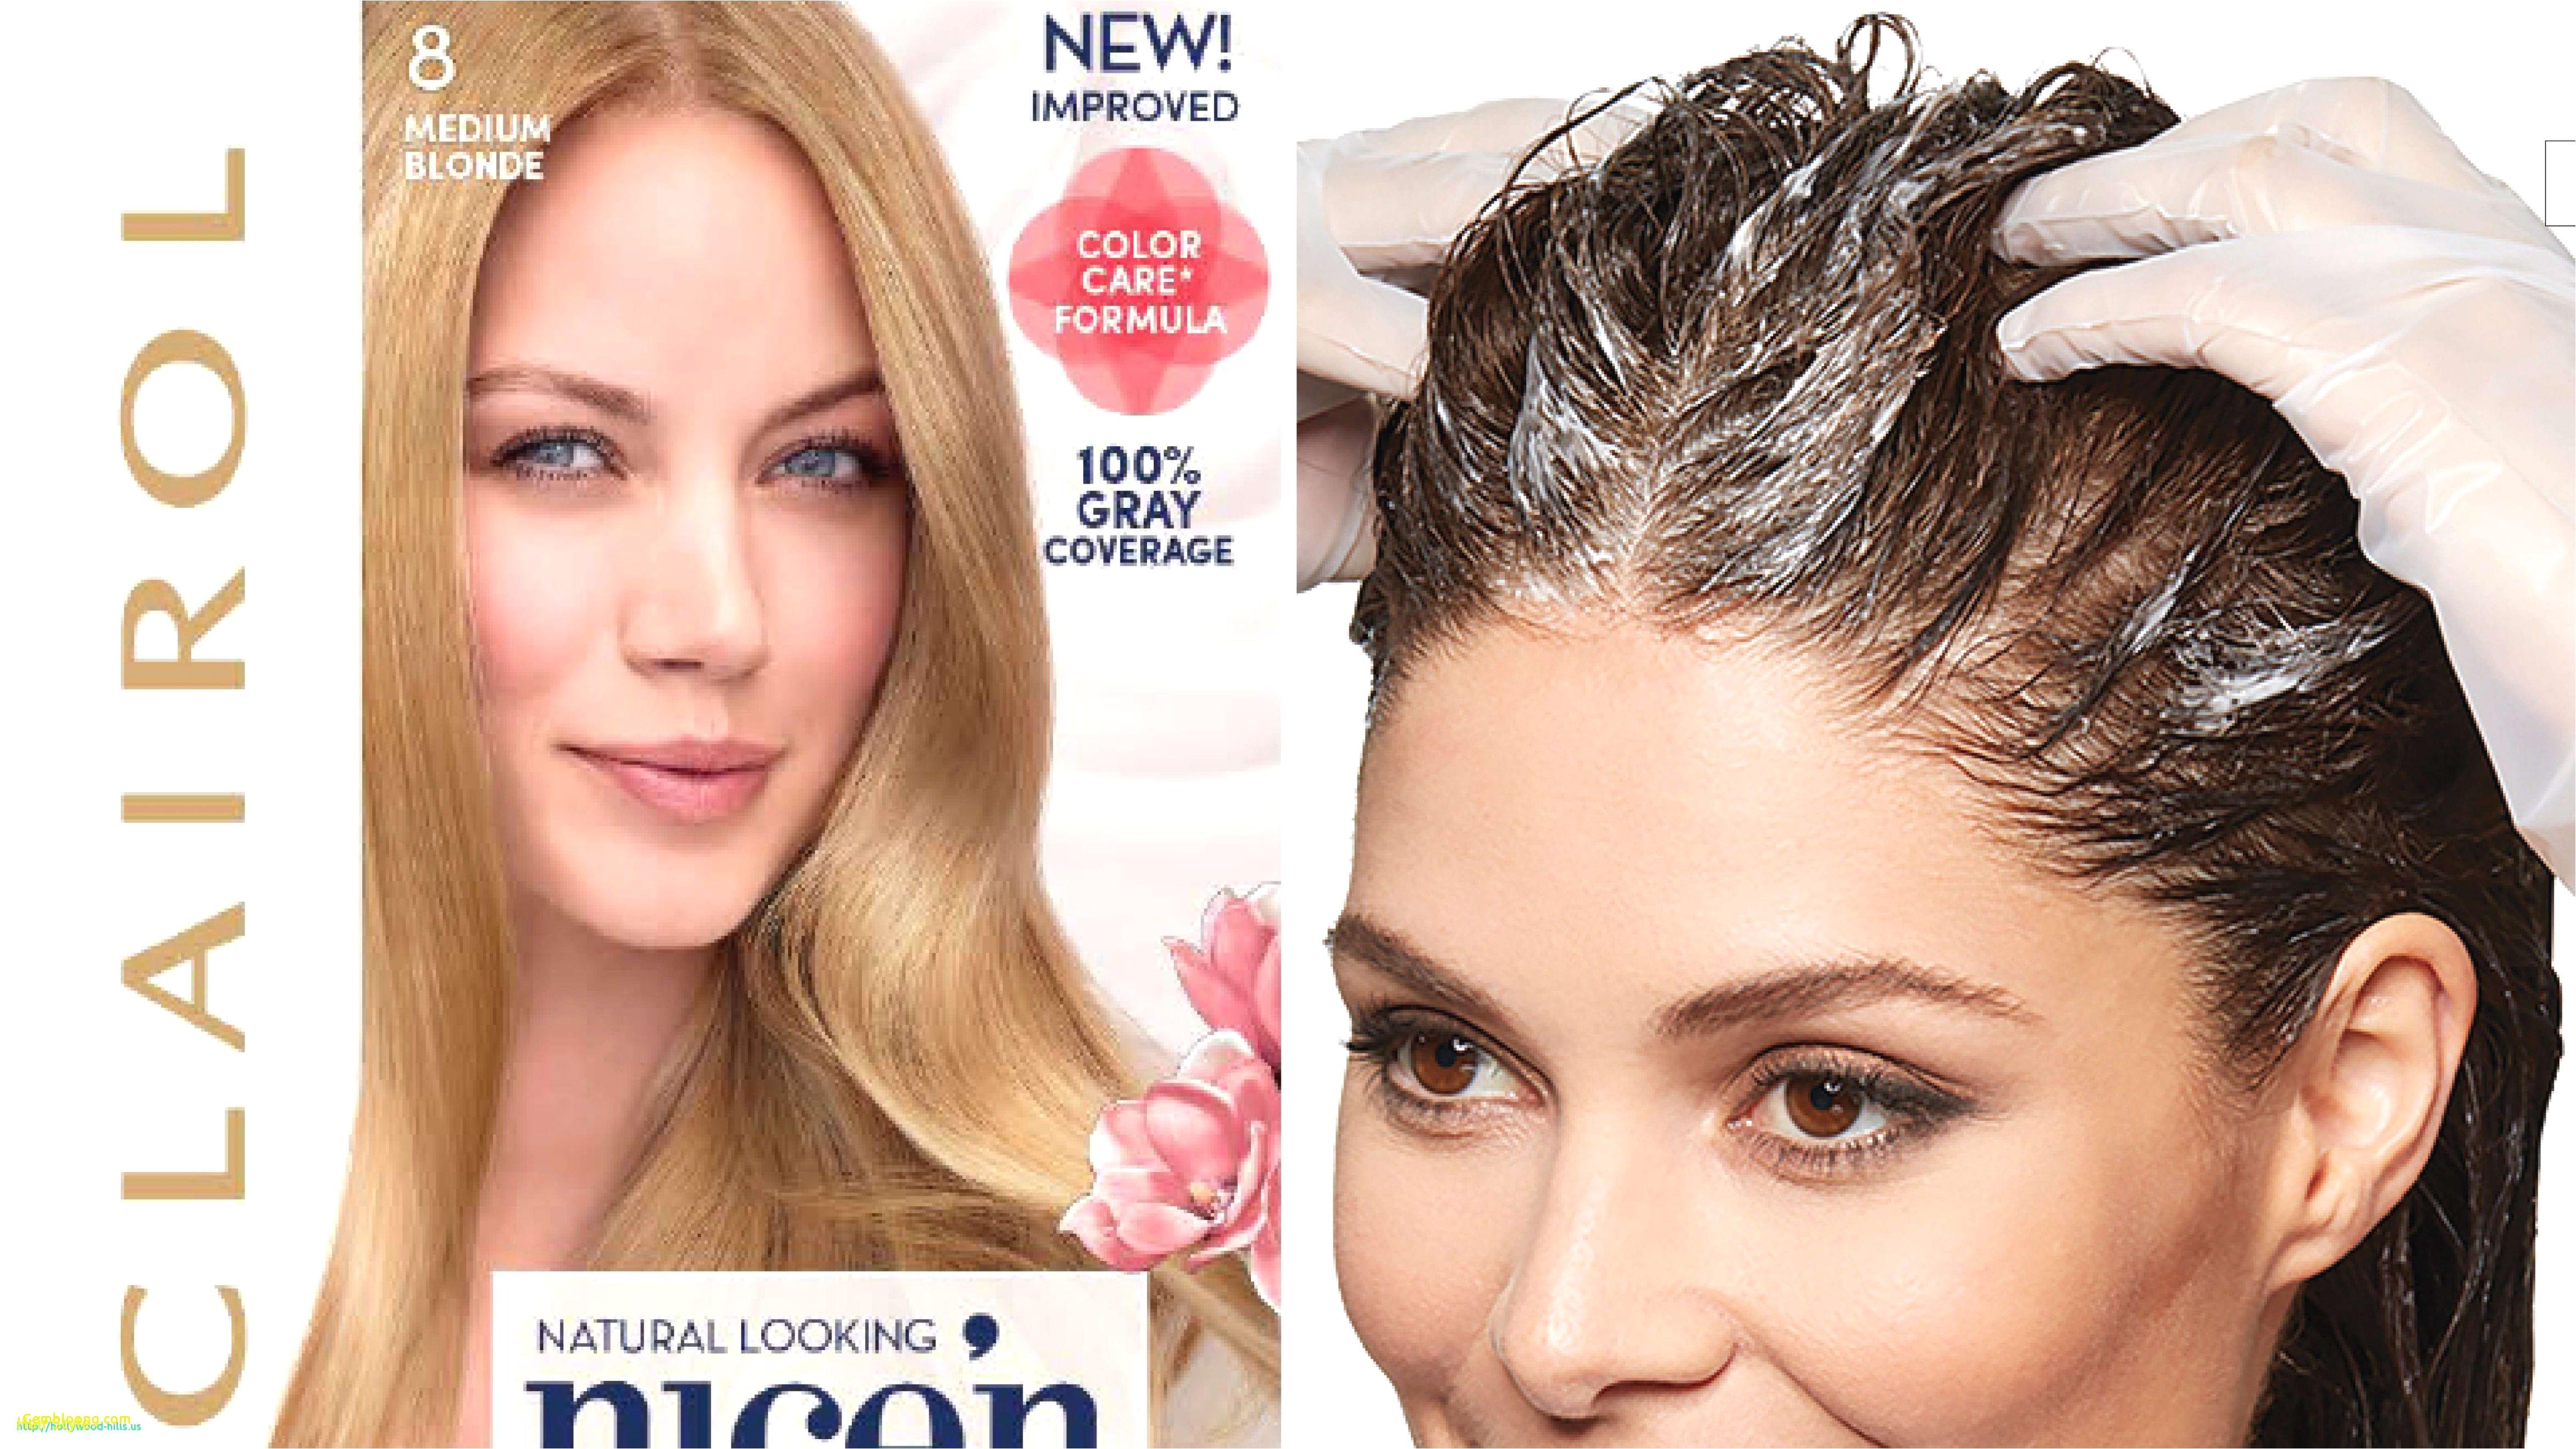 hair dye styles beautiful i pinimg 1200x 0d 60 8a 0d608a58a4bb3ed3b as well straight hair types